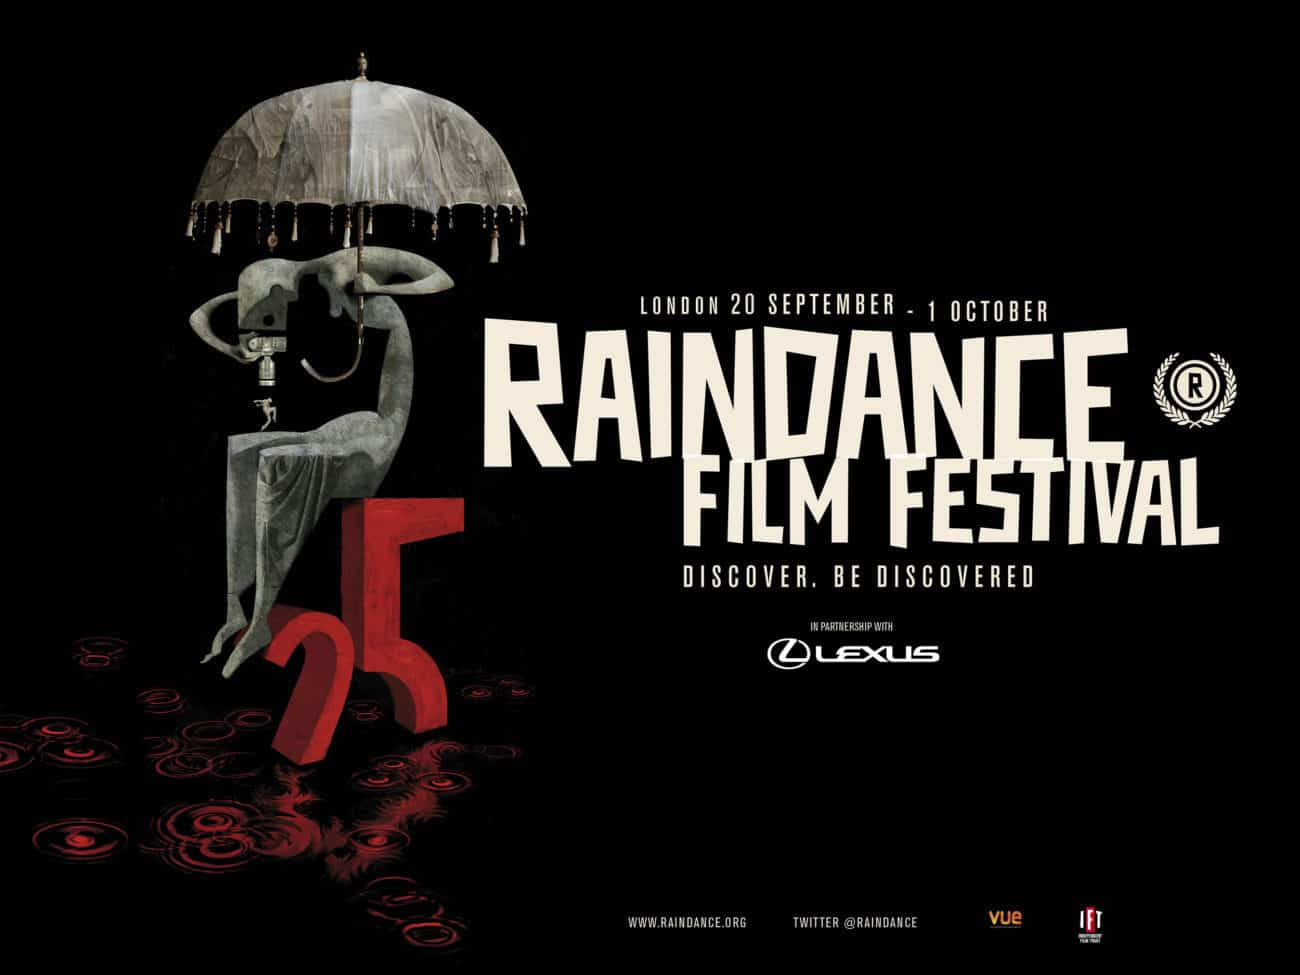 Raindance 25th